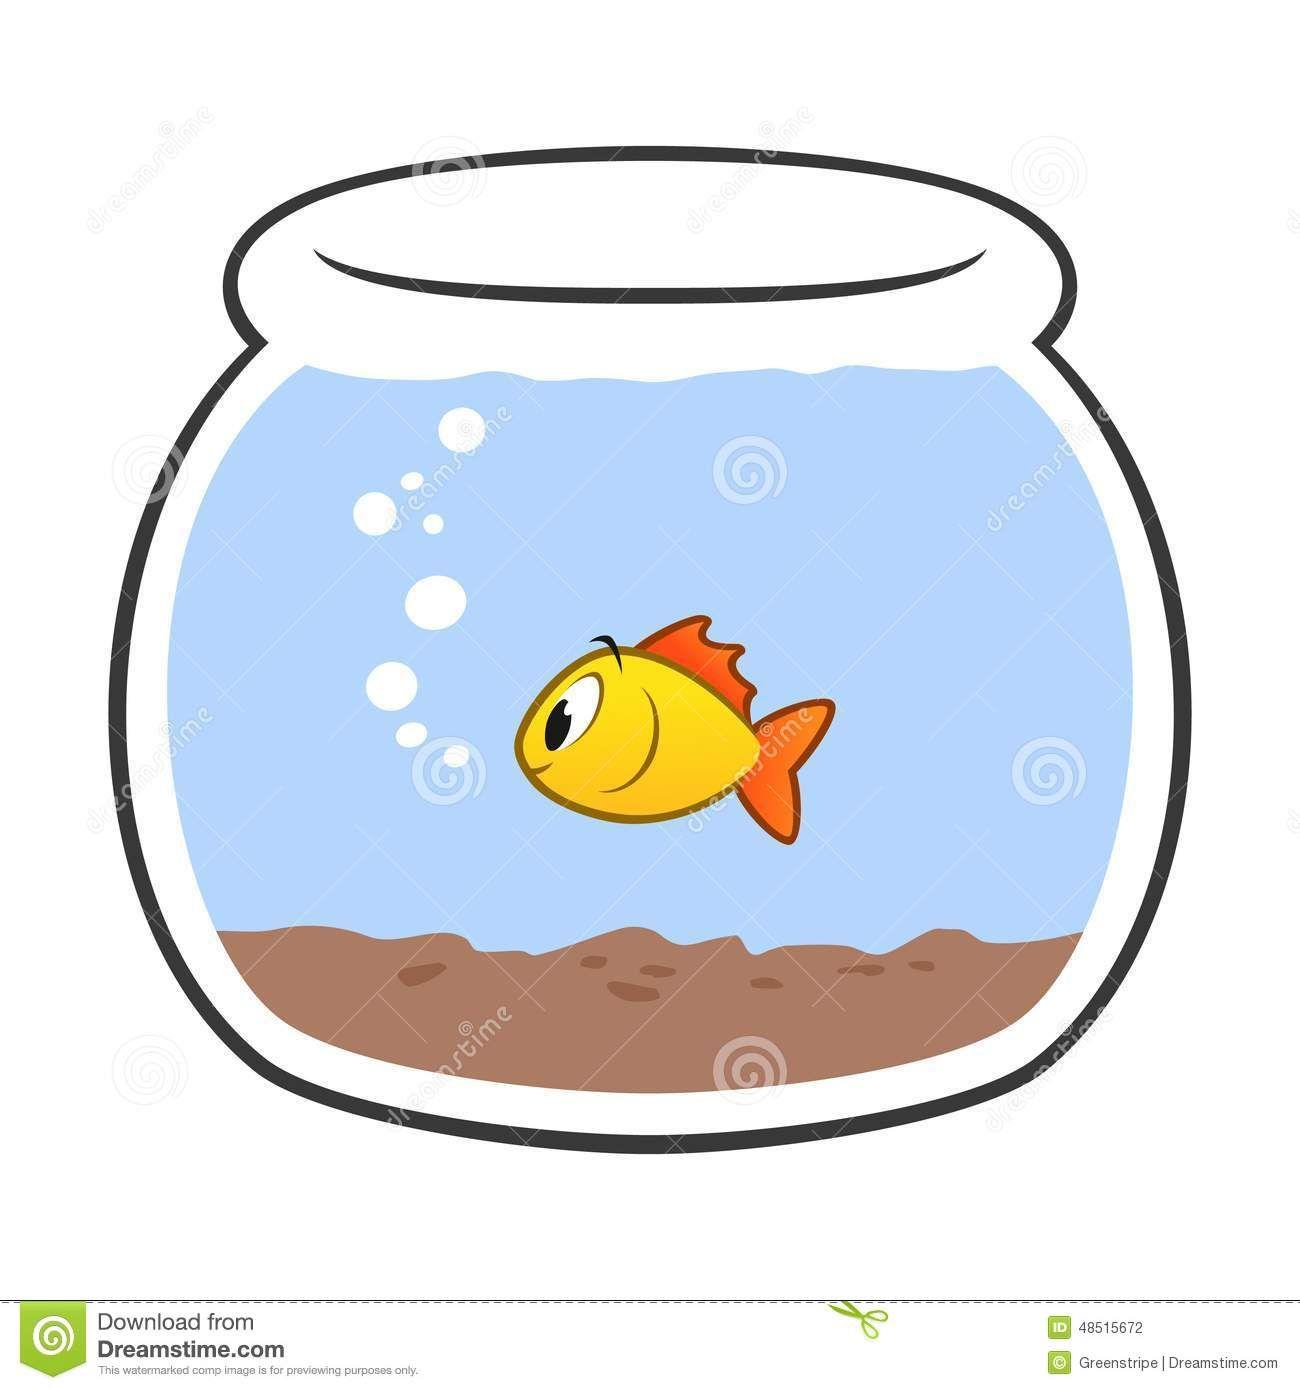 Fishbowl Clipart Goldfish Fish Bowl Clip Art Royalty Free